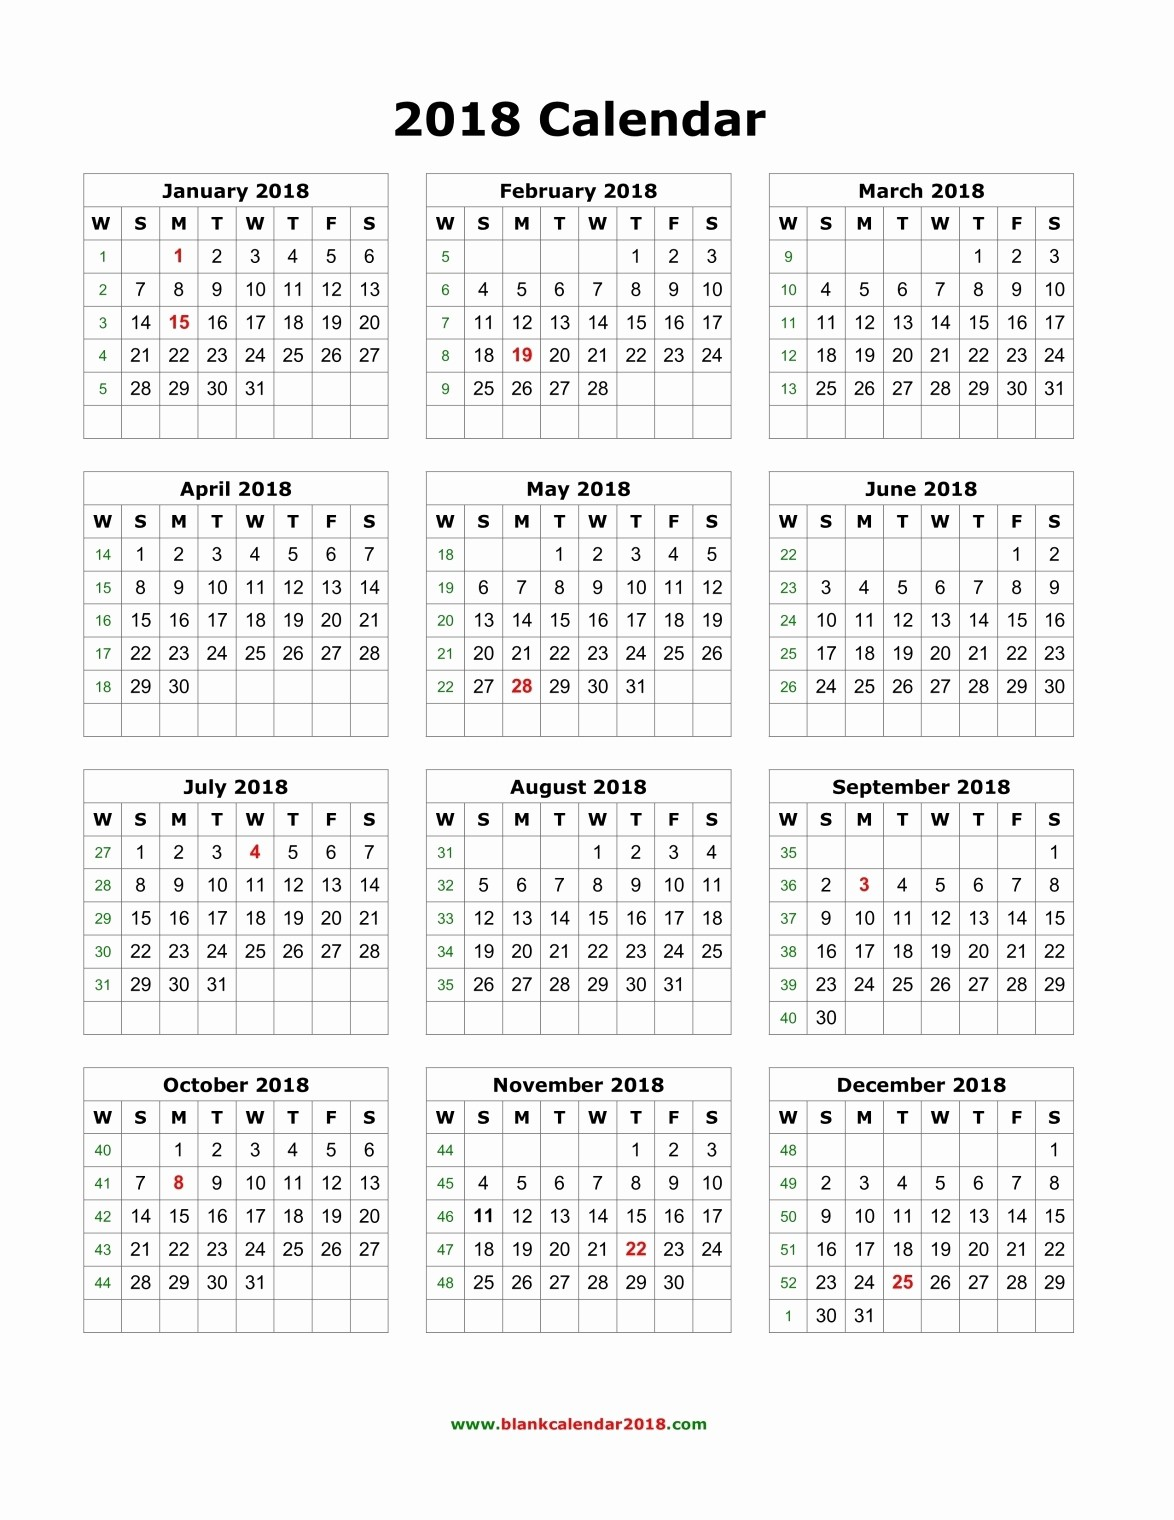 Microsoft Word 2018 Calendar Templates Lovely Blank Calendar 2018